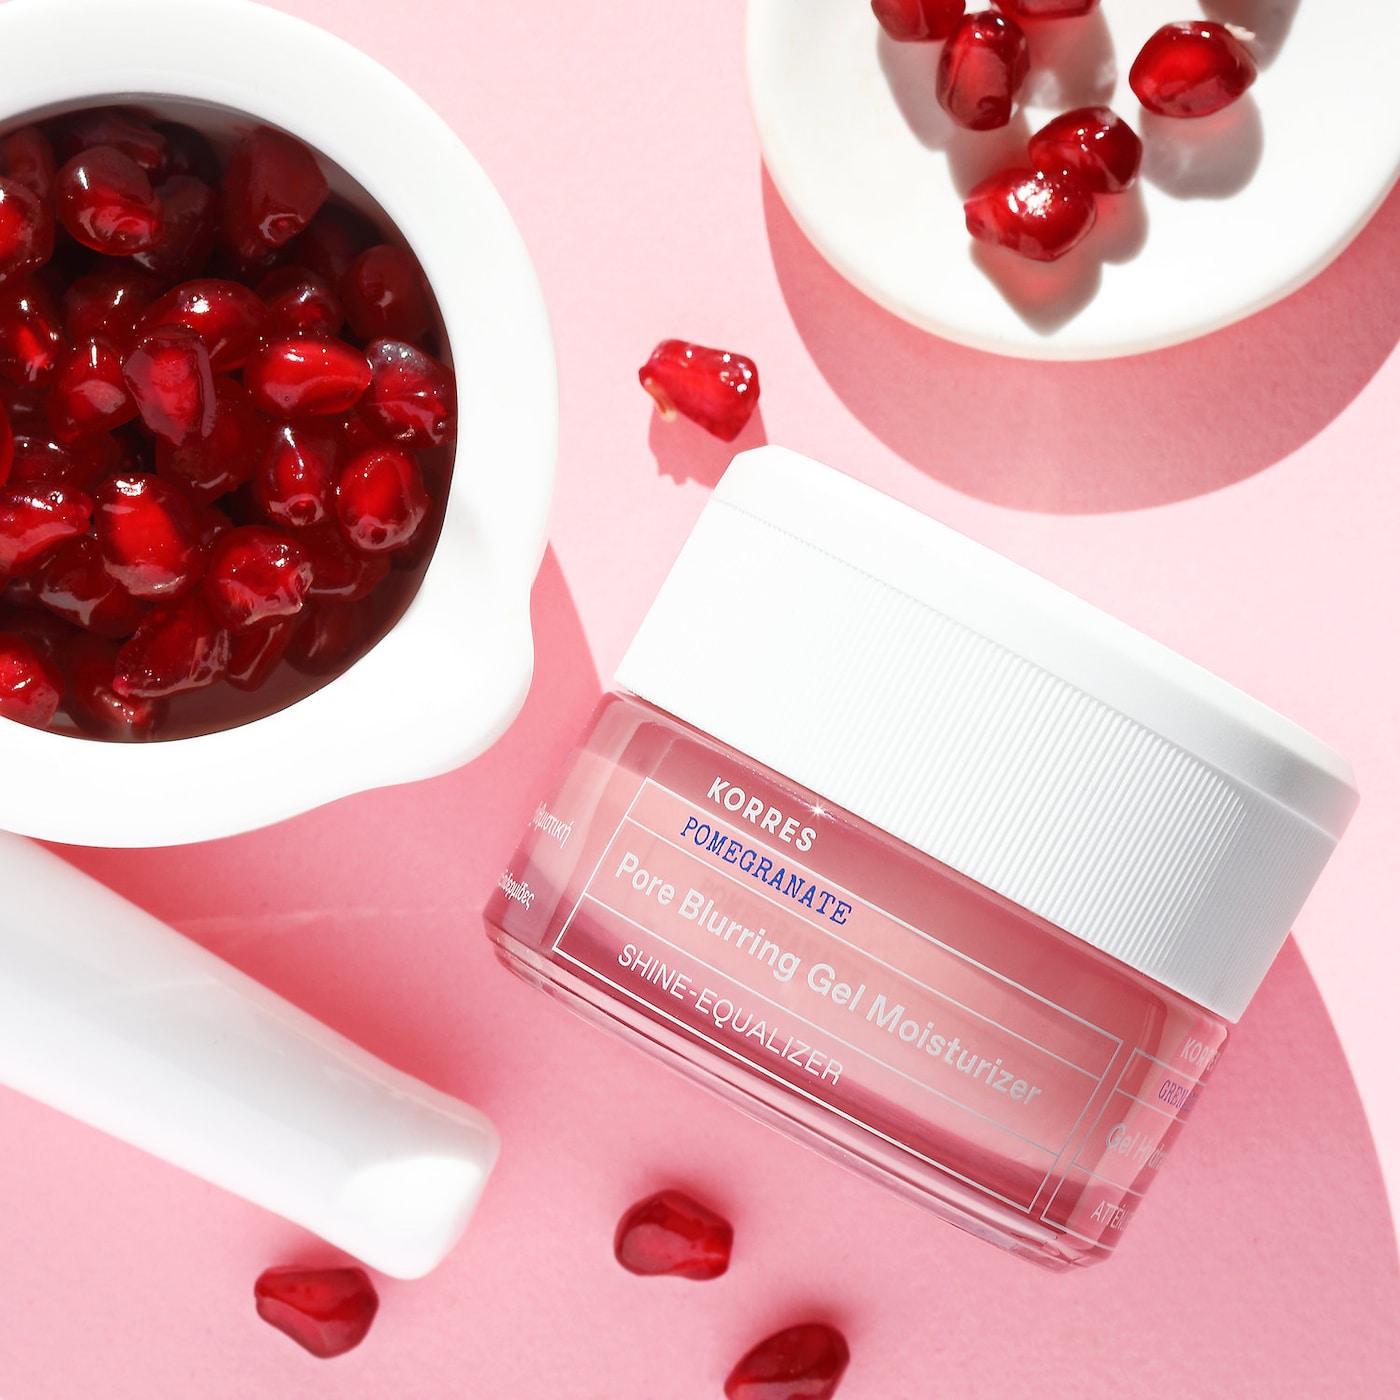 KORRES Pomegranate Pore Blurring Gel Moisturizer and cherries